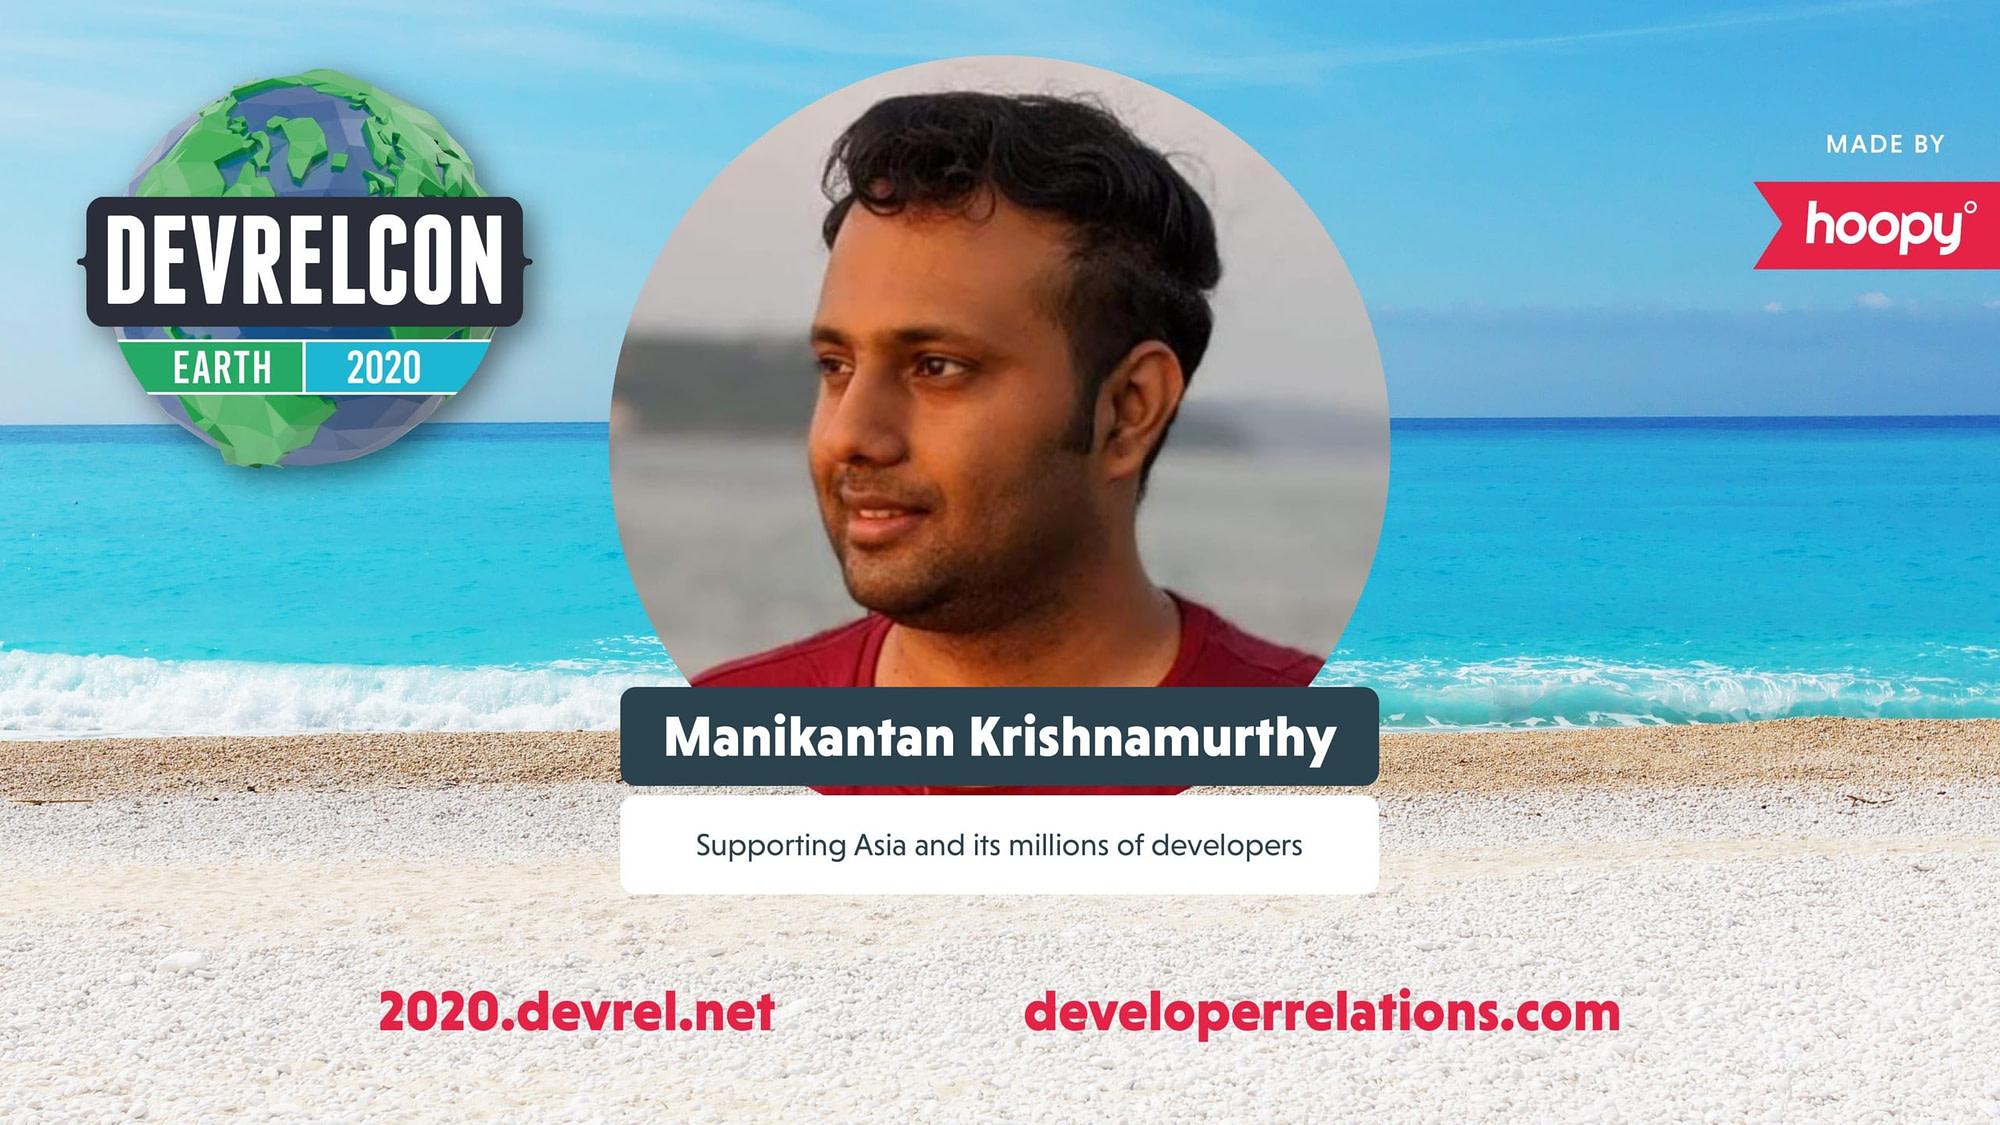 Manikantan Krishnamurthy